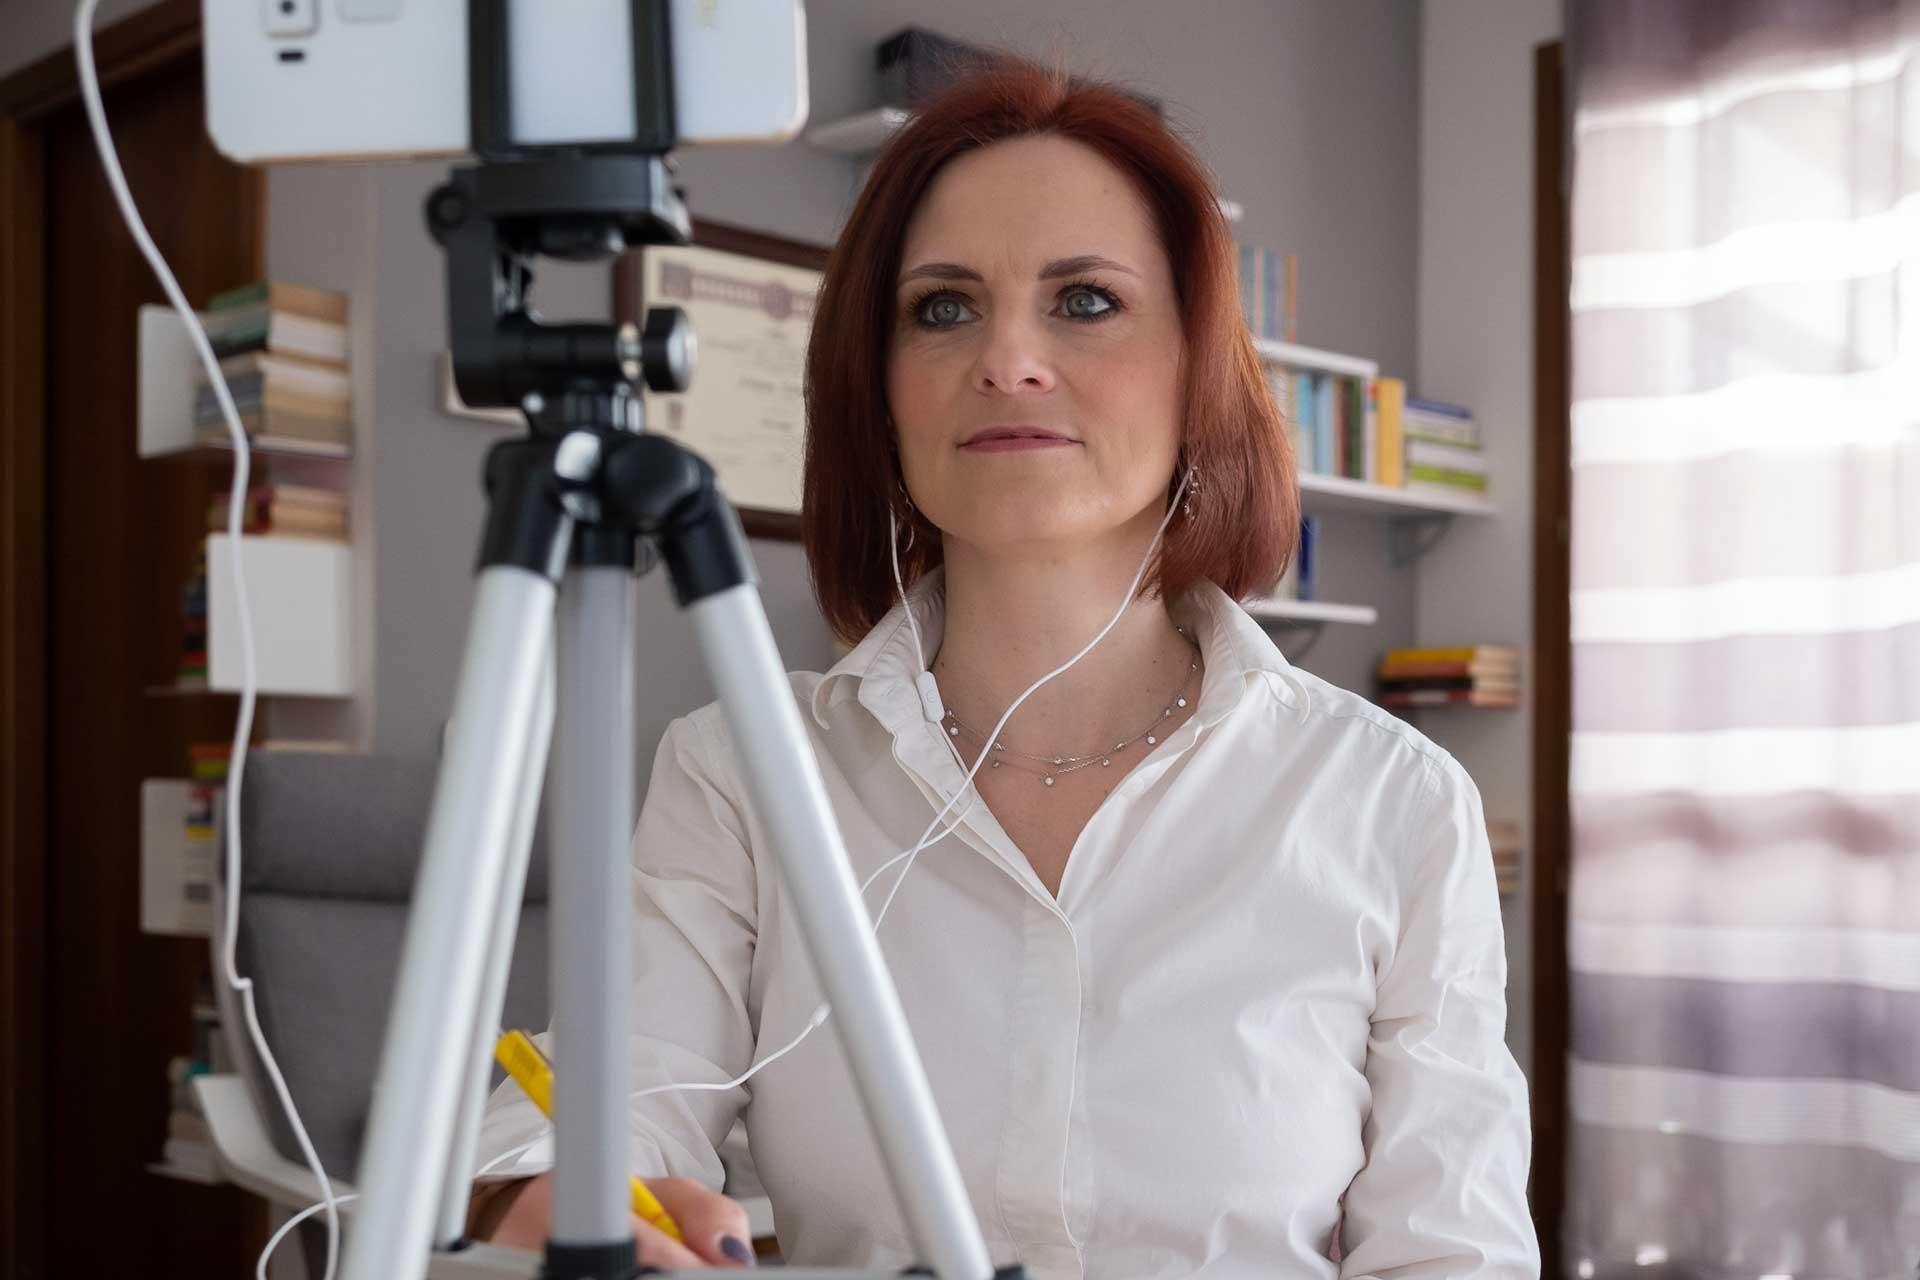 Dott.ssa Zanatta Consulenza Psicologica Online via Skype